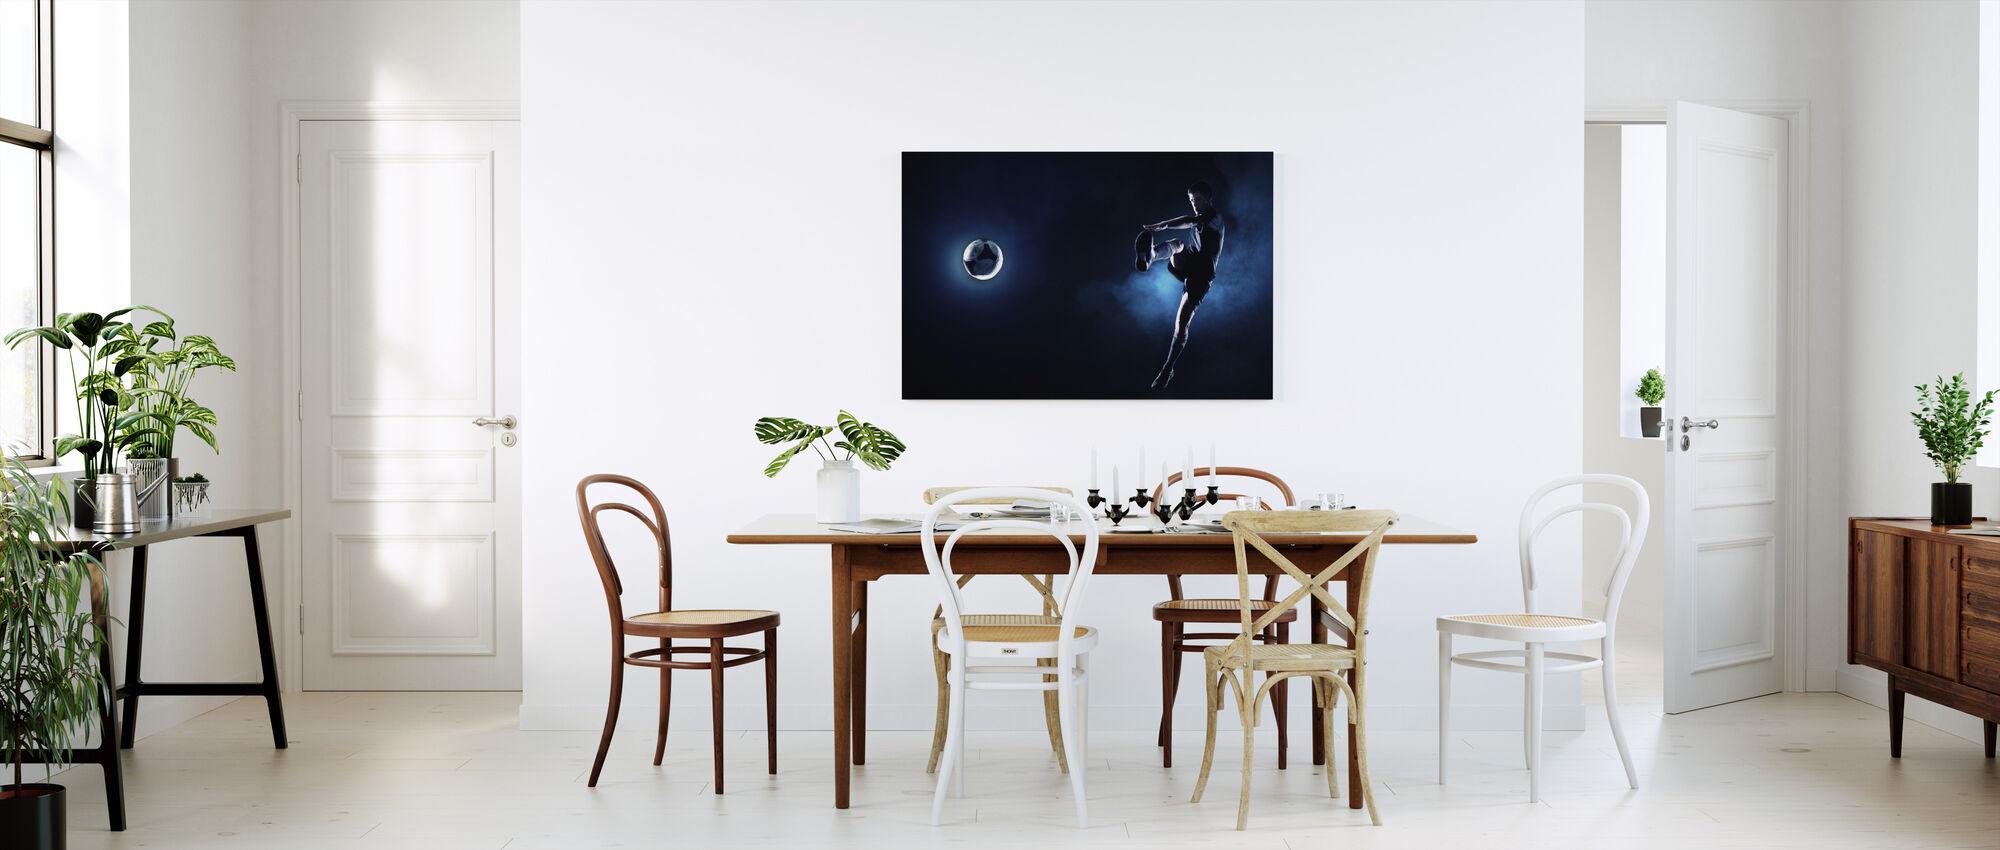 Blauw Steel Voetbal - Canvas print - Keuken